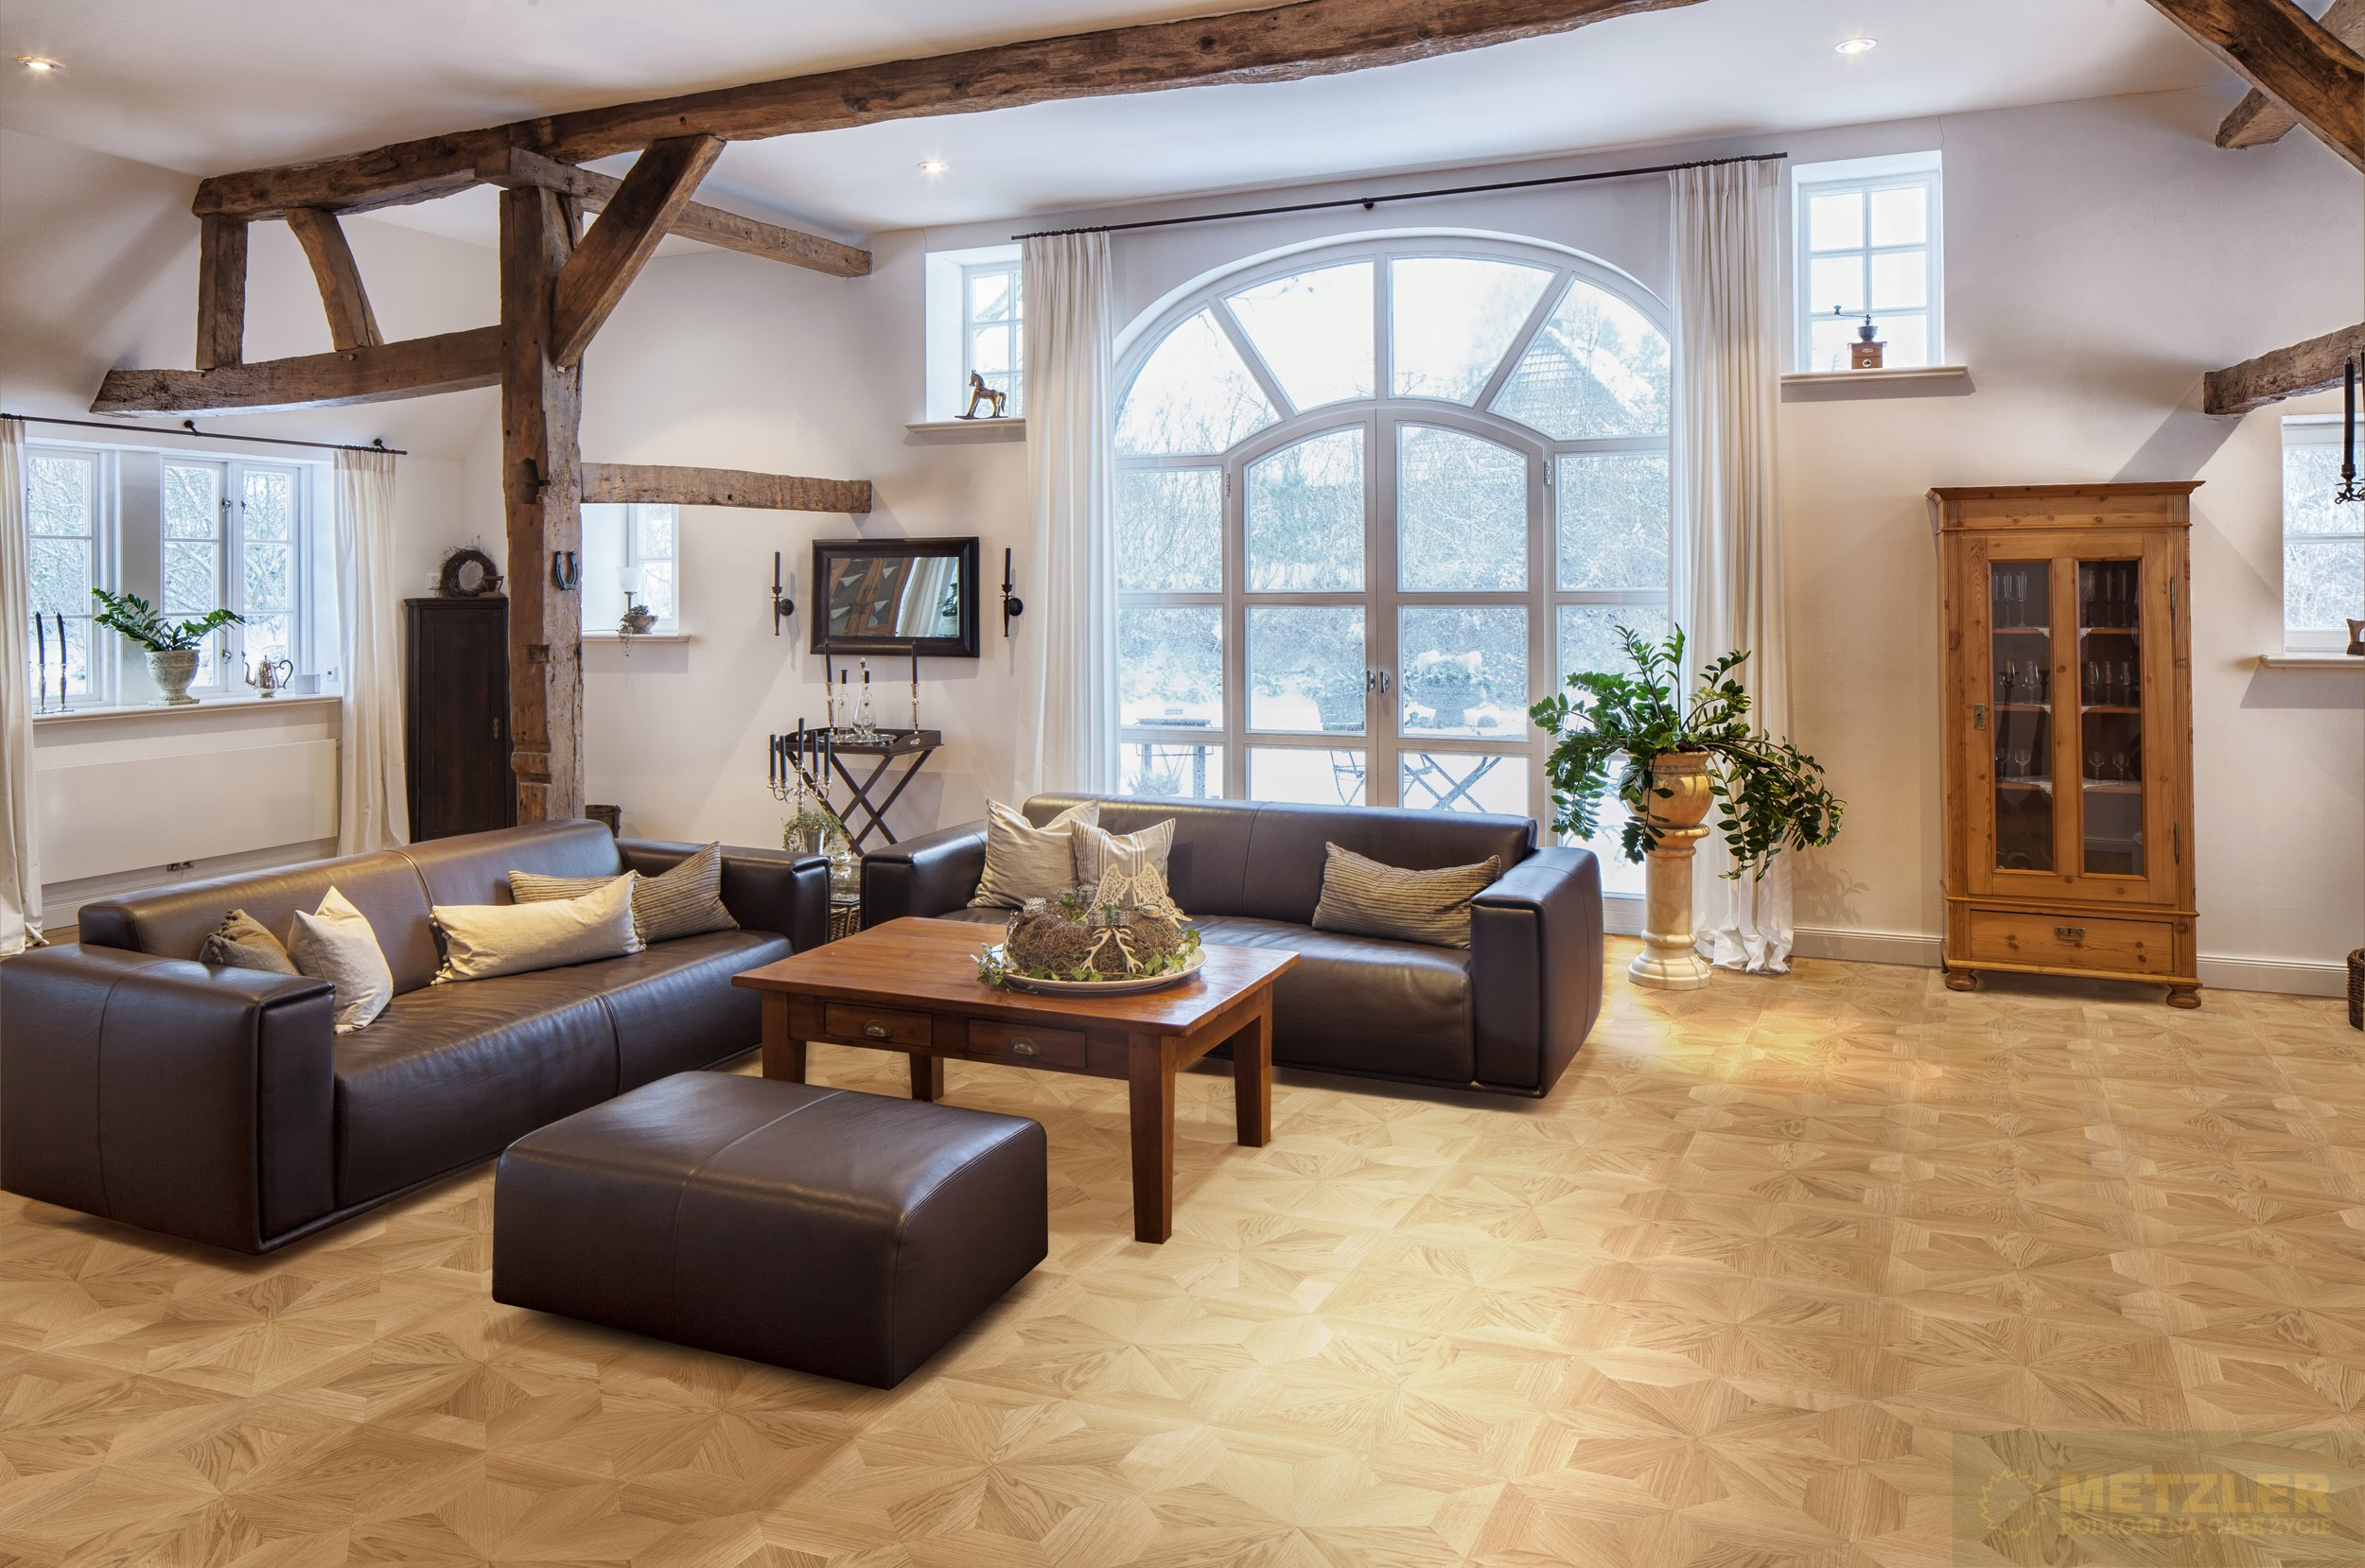 Windsor mozaika pa acowa d b natur parkiet pa acowy for Wohnzimmer klassisch einrichten